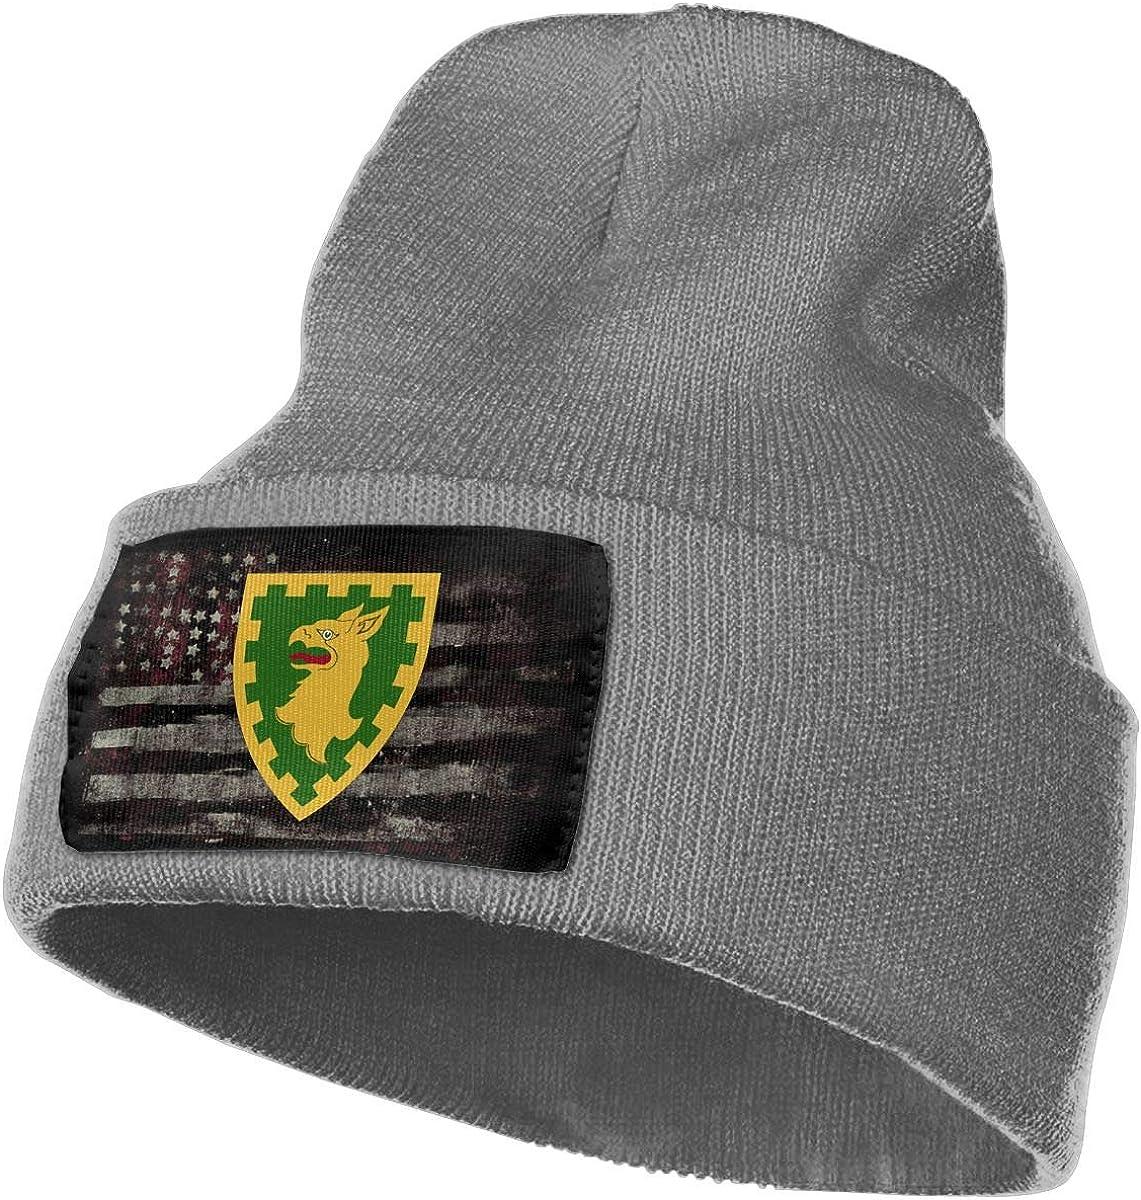 FORDSAN CP US Army 15th Military Police Brigade Mens Beanie Cap Skull Cap Winter Warm Knitting Hats.